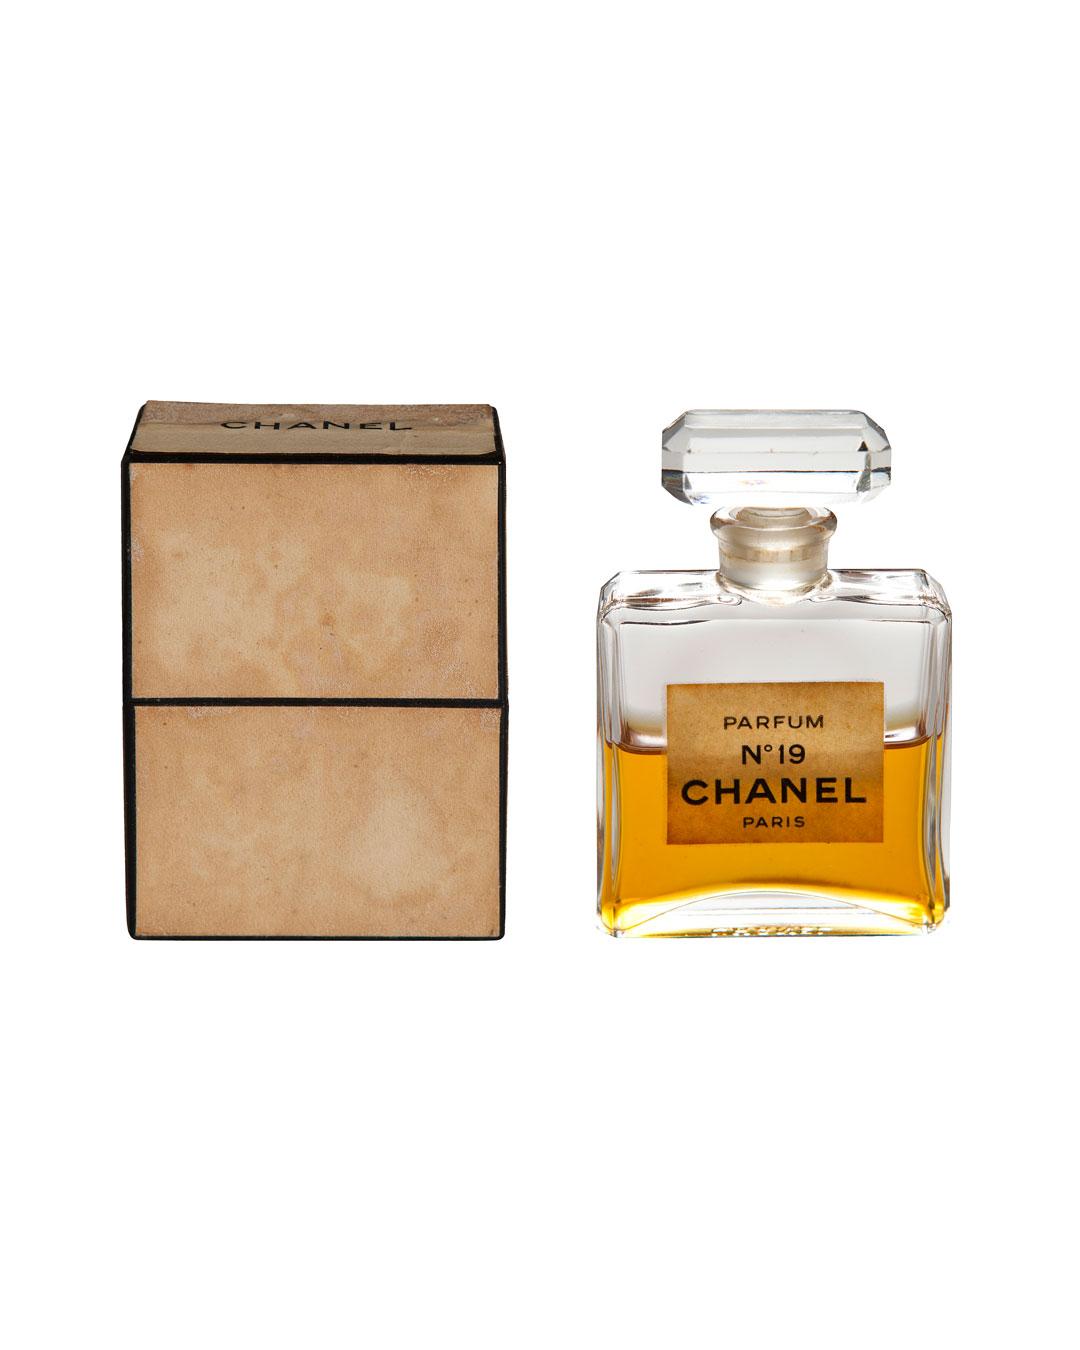 Annelies Planteijdt, Mooie stad – Collier en Chanel no.19, 2017, flesje Chanel no.19 (afbeelding 3/3)